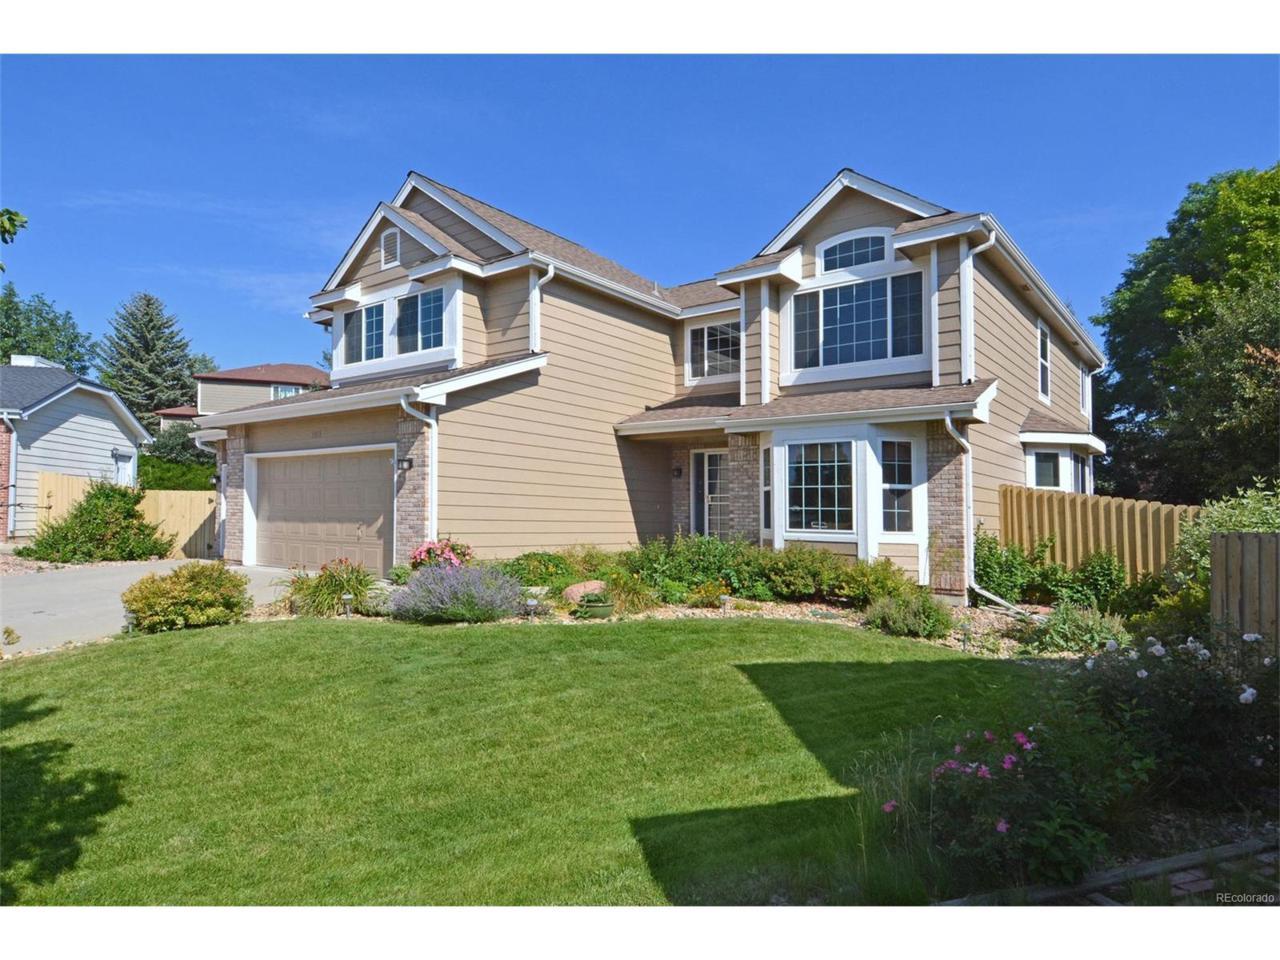 1511 S Proctor Court, Superior, CO 80027 (MLS #5864060) :: 8z Real Estate